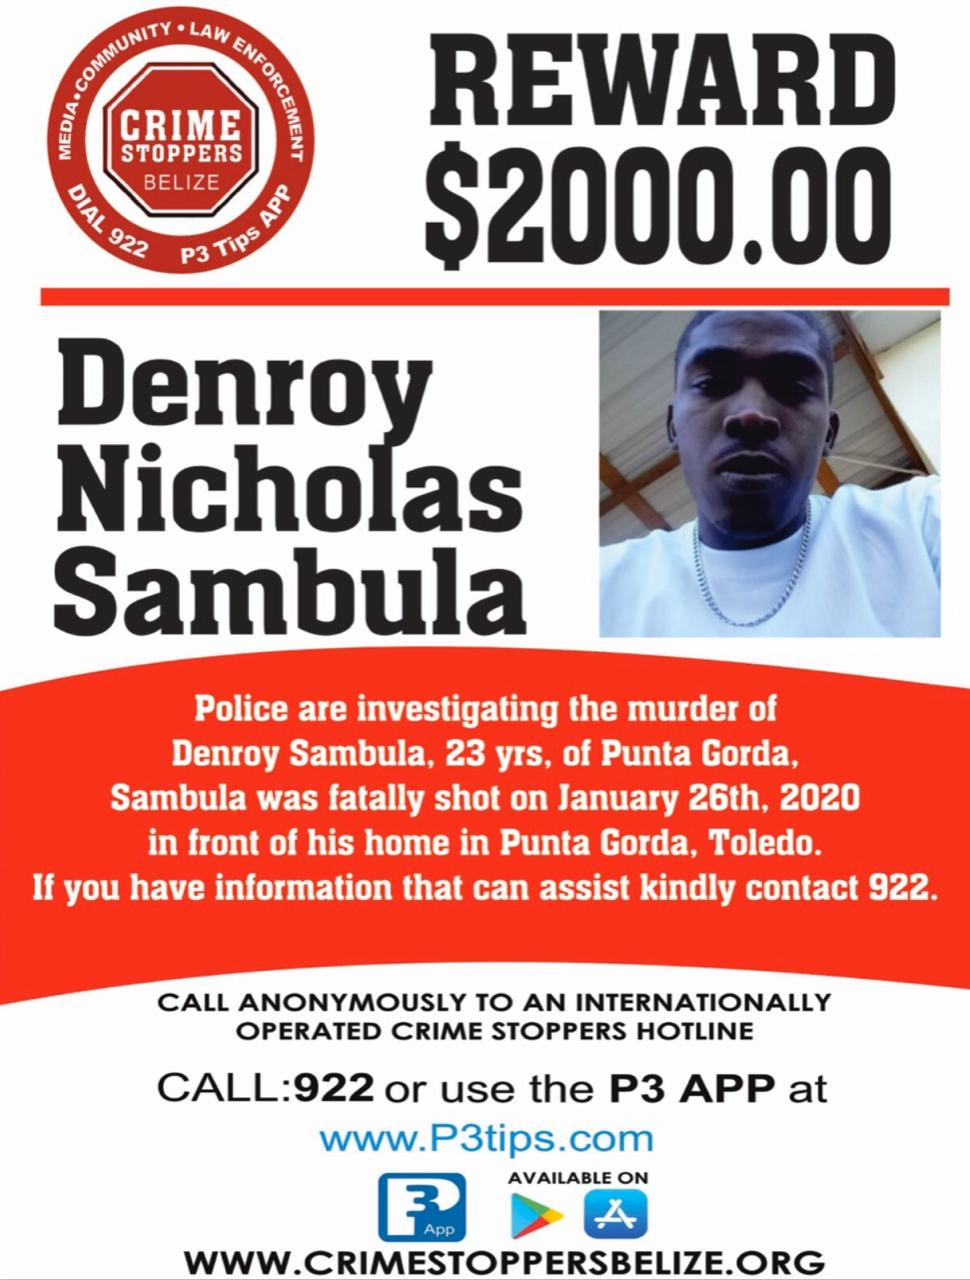 Denroy Nicholas Sambula